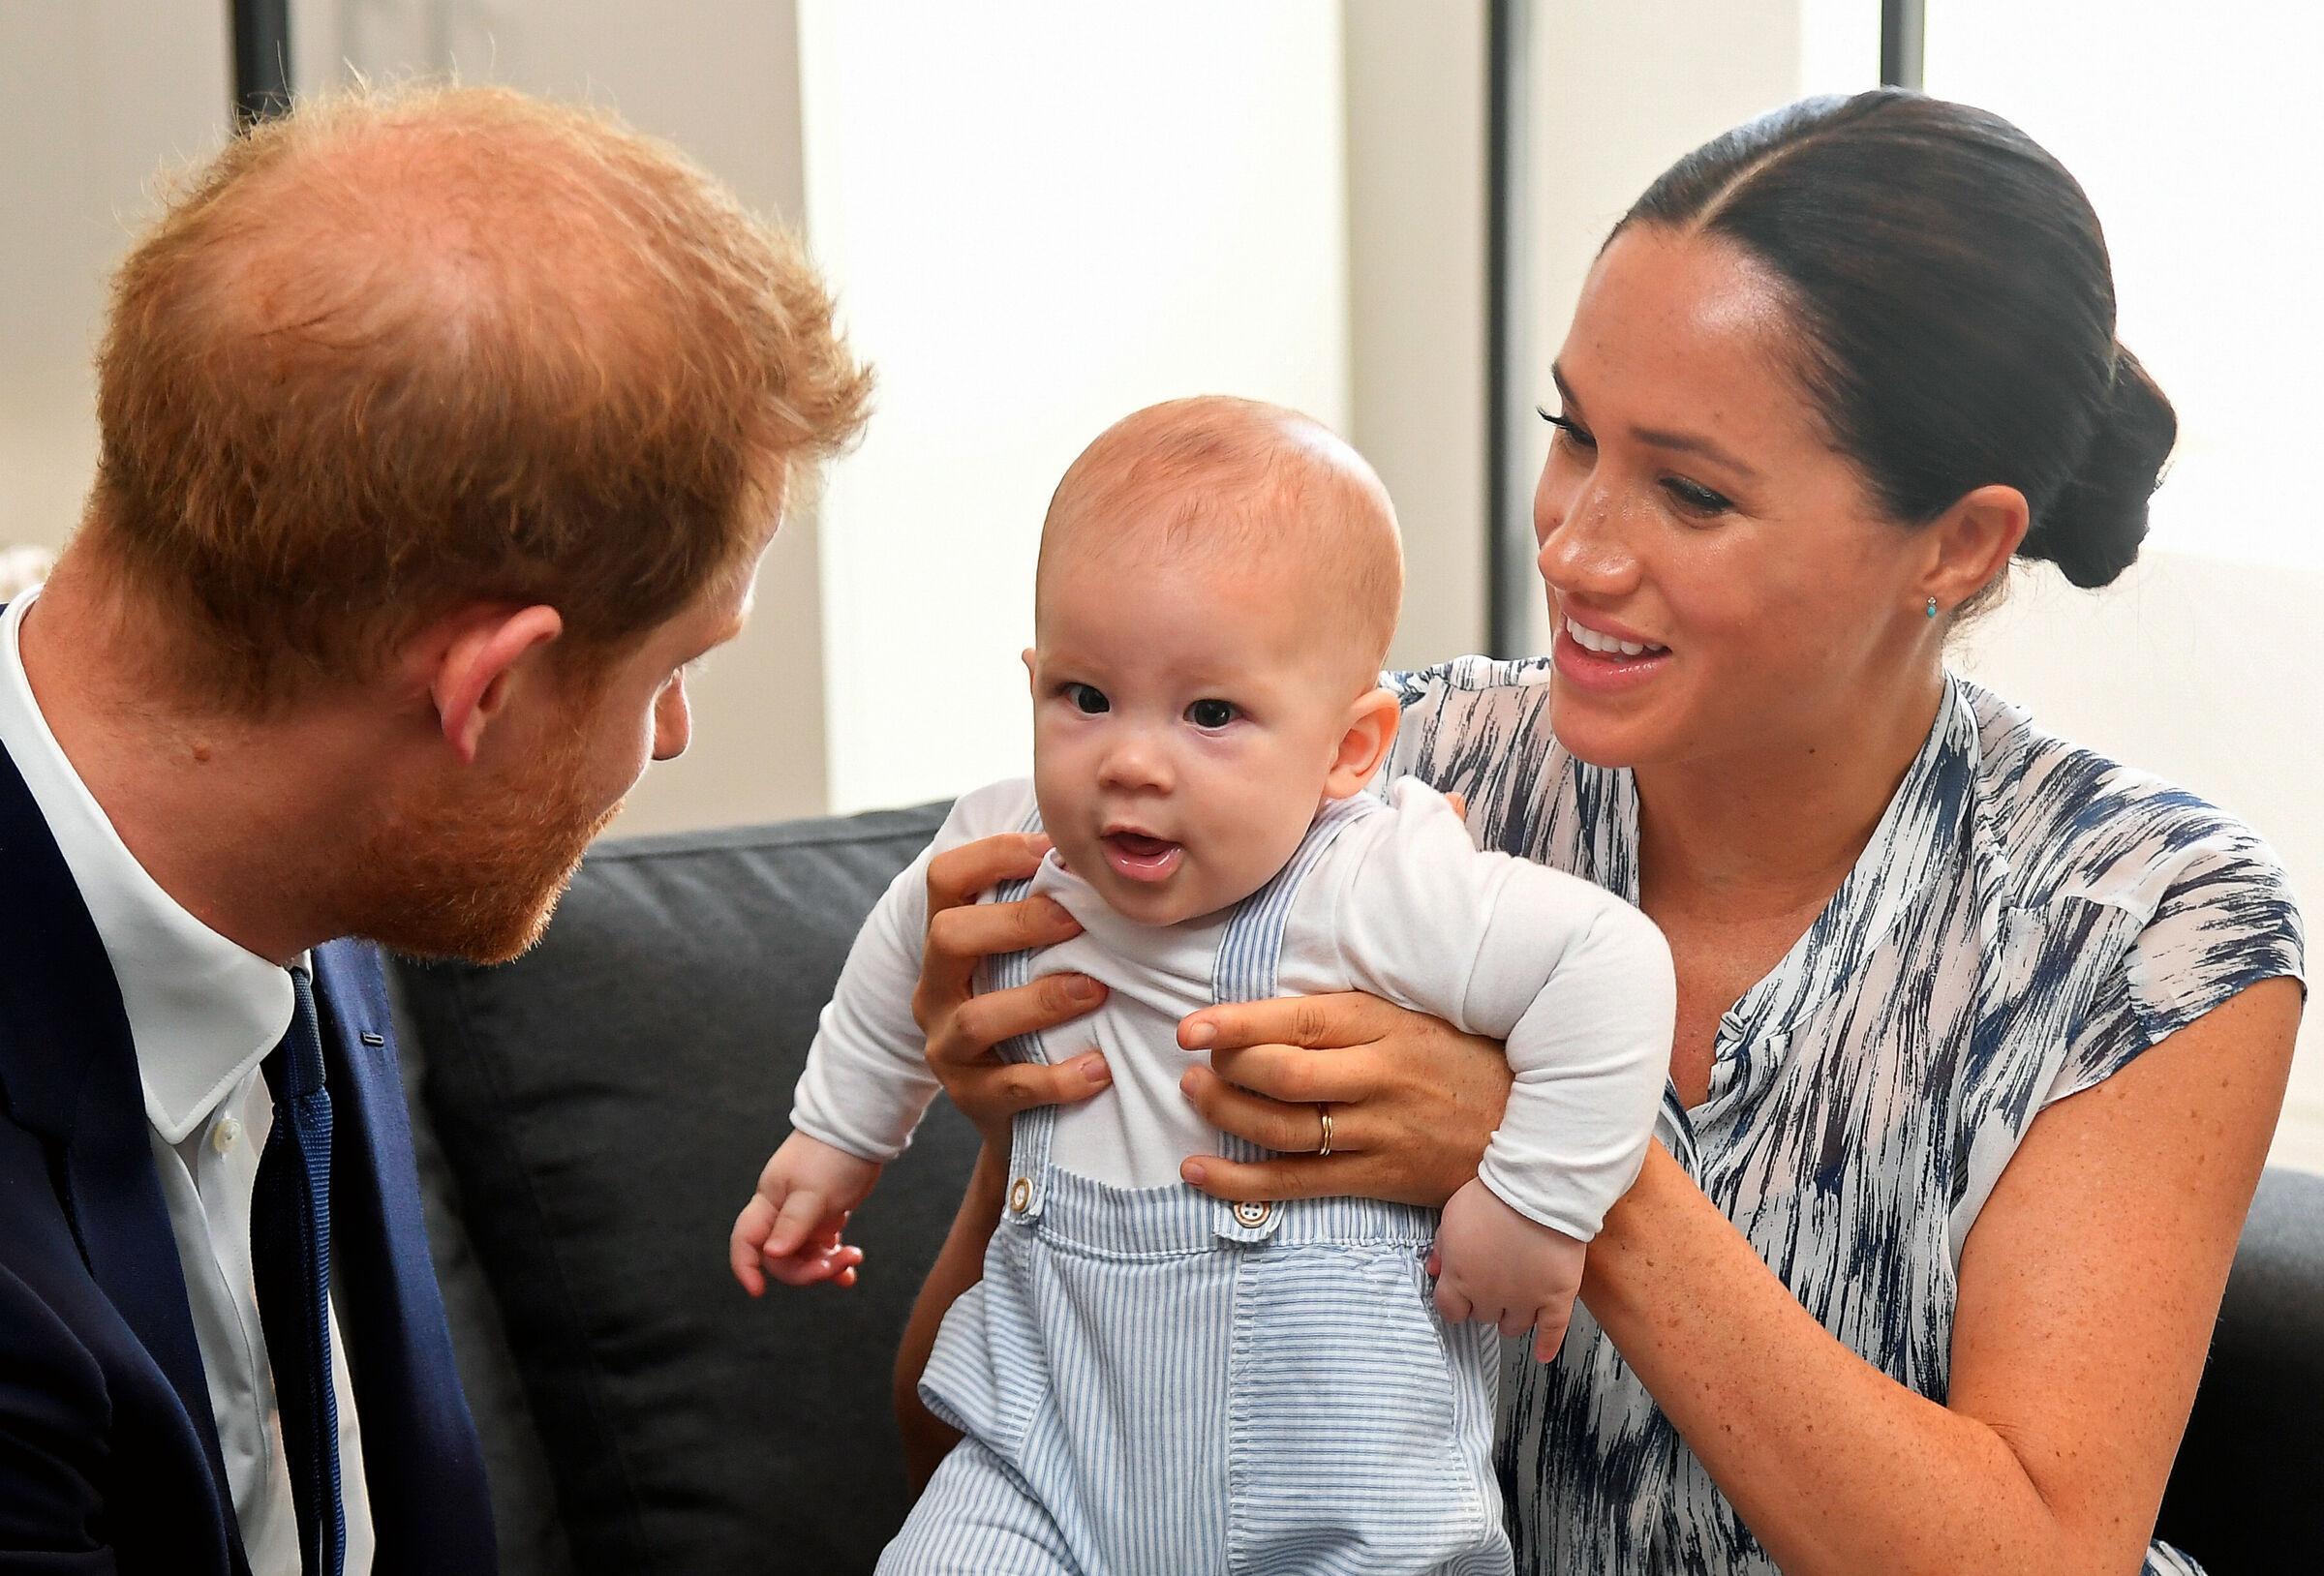 Princípe Harry, Megan Markle e o filho Archie